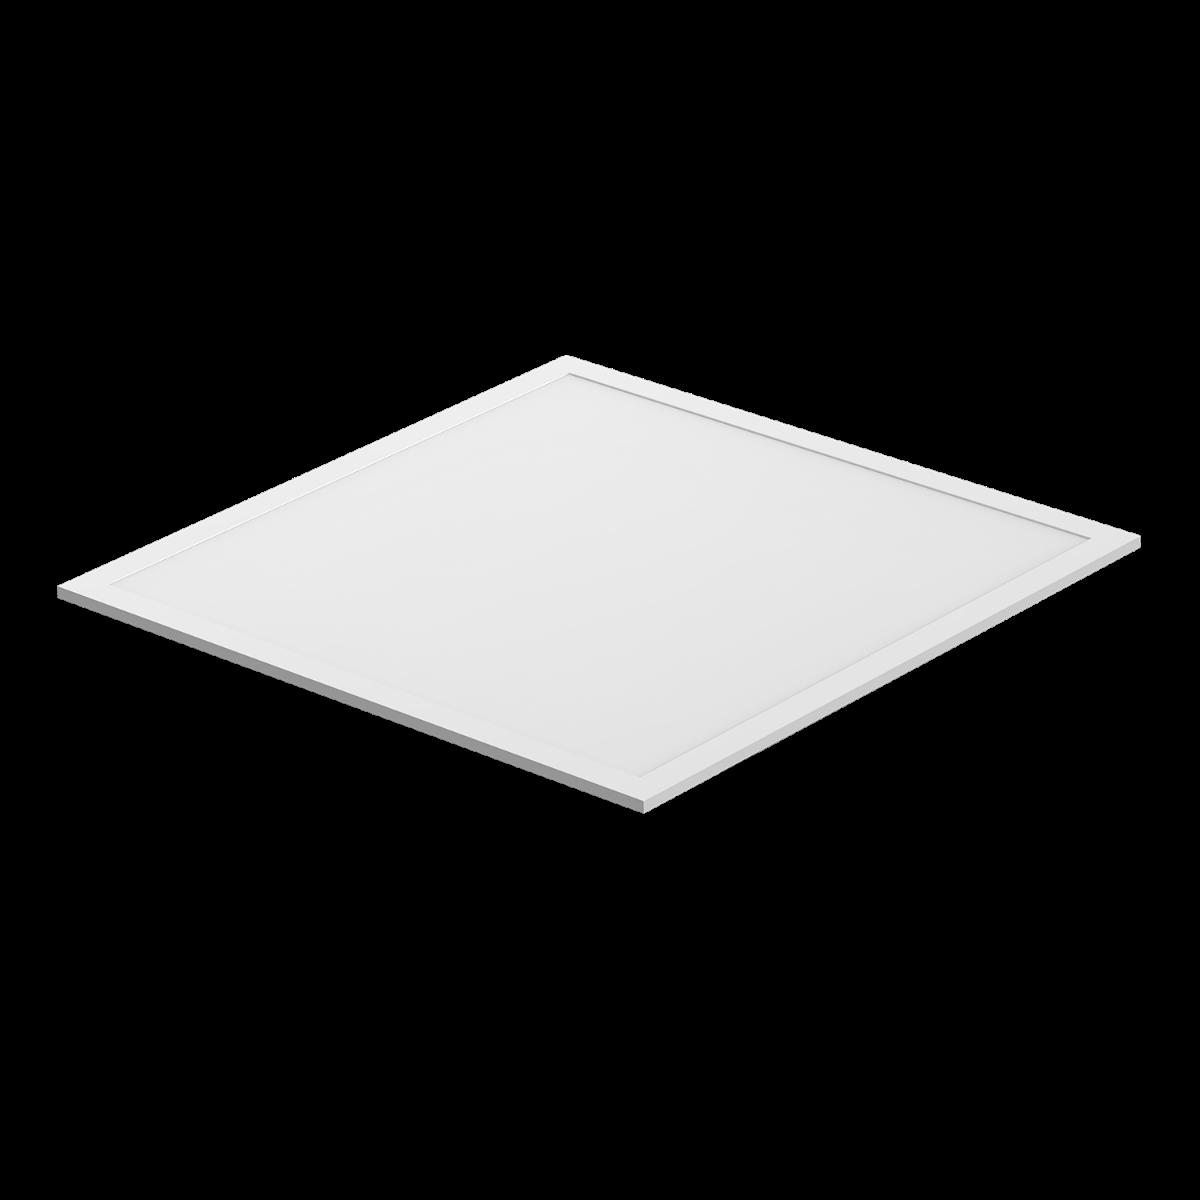 Noxion LED Panel Econox 32W Xitanium DALI 60x60cm 3000K 3900lm UGR <22 | Dali Dimmable - Warm White - Replaces 4x18W